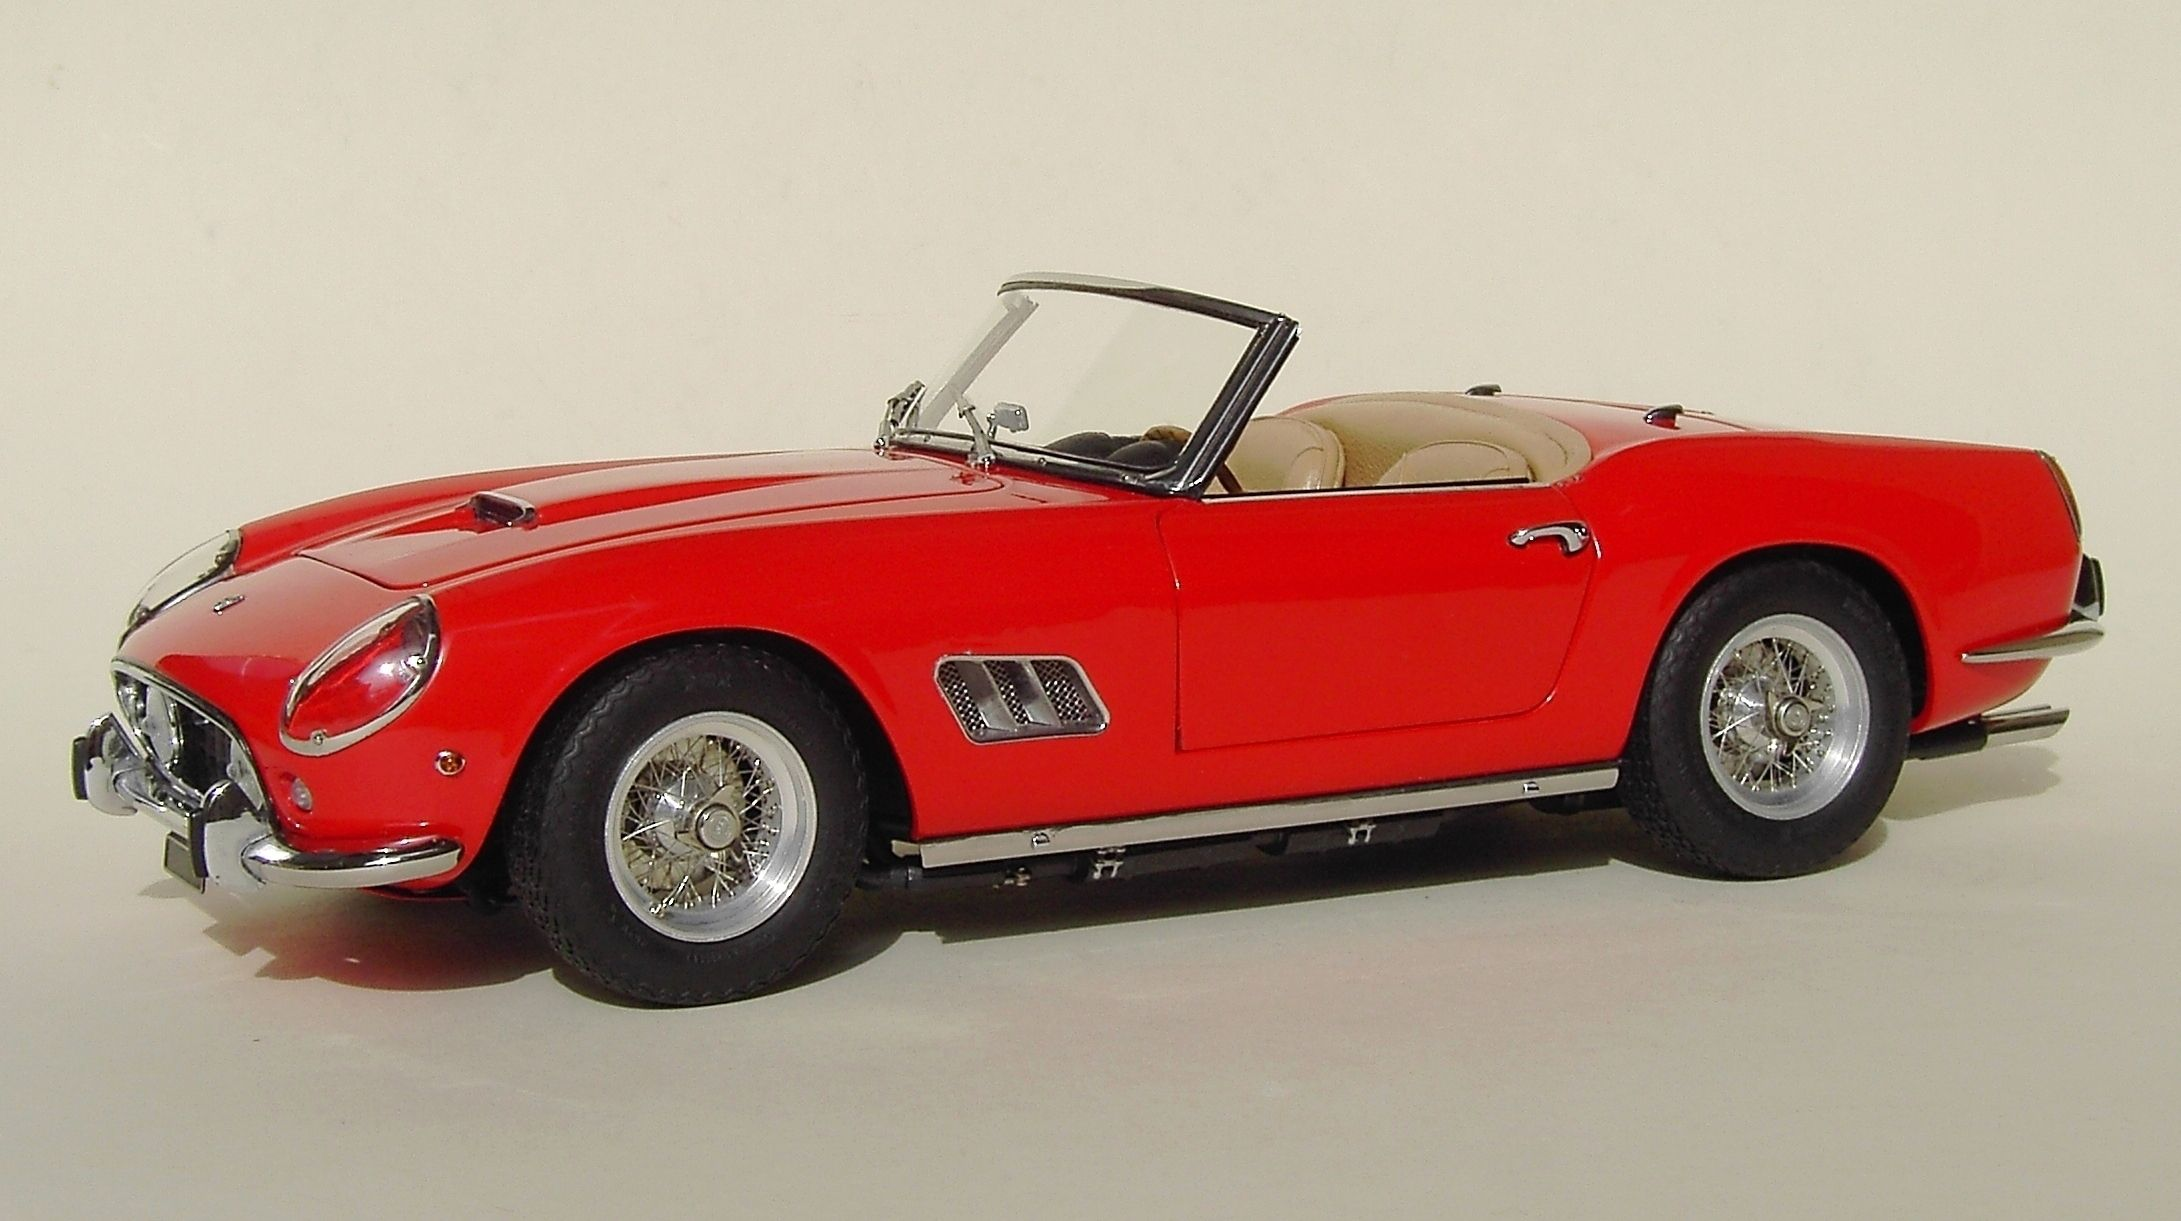 d377846181755a056d9a2080cb5f54eb Fabulous Ferrari Mondial 8 Super Elite Cars Trend